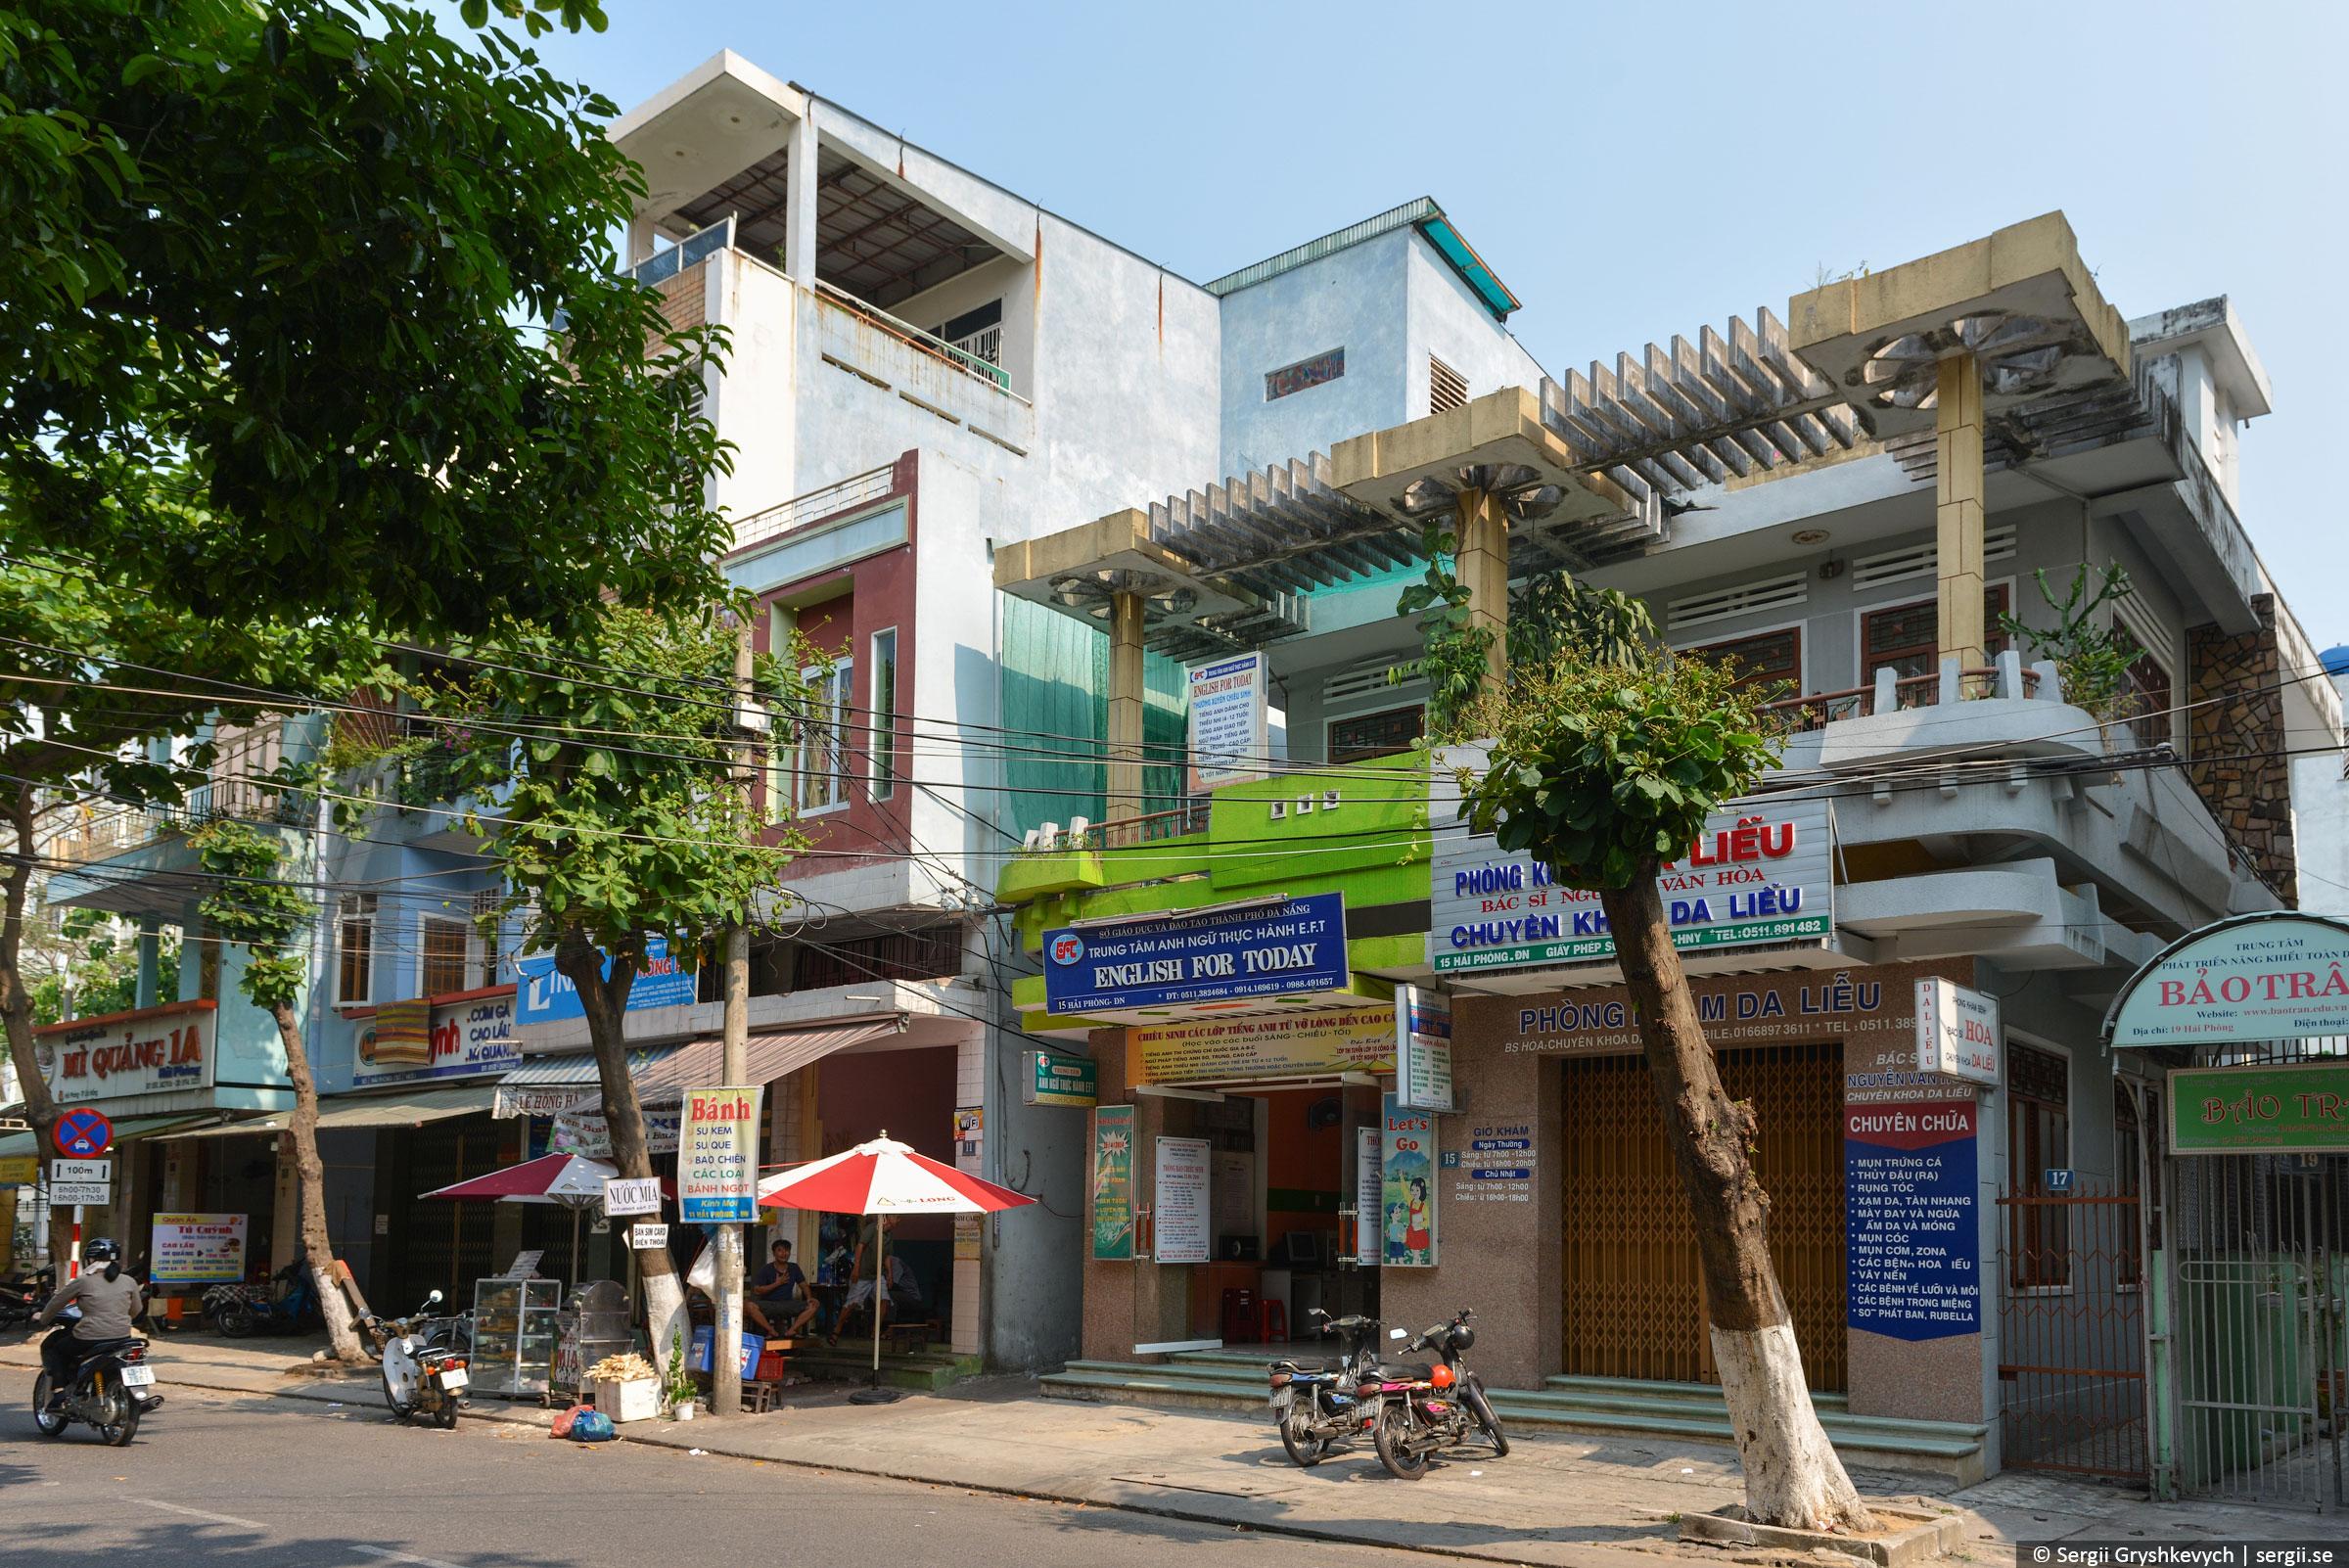 da-nang-vietnam-2014-10